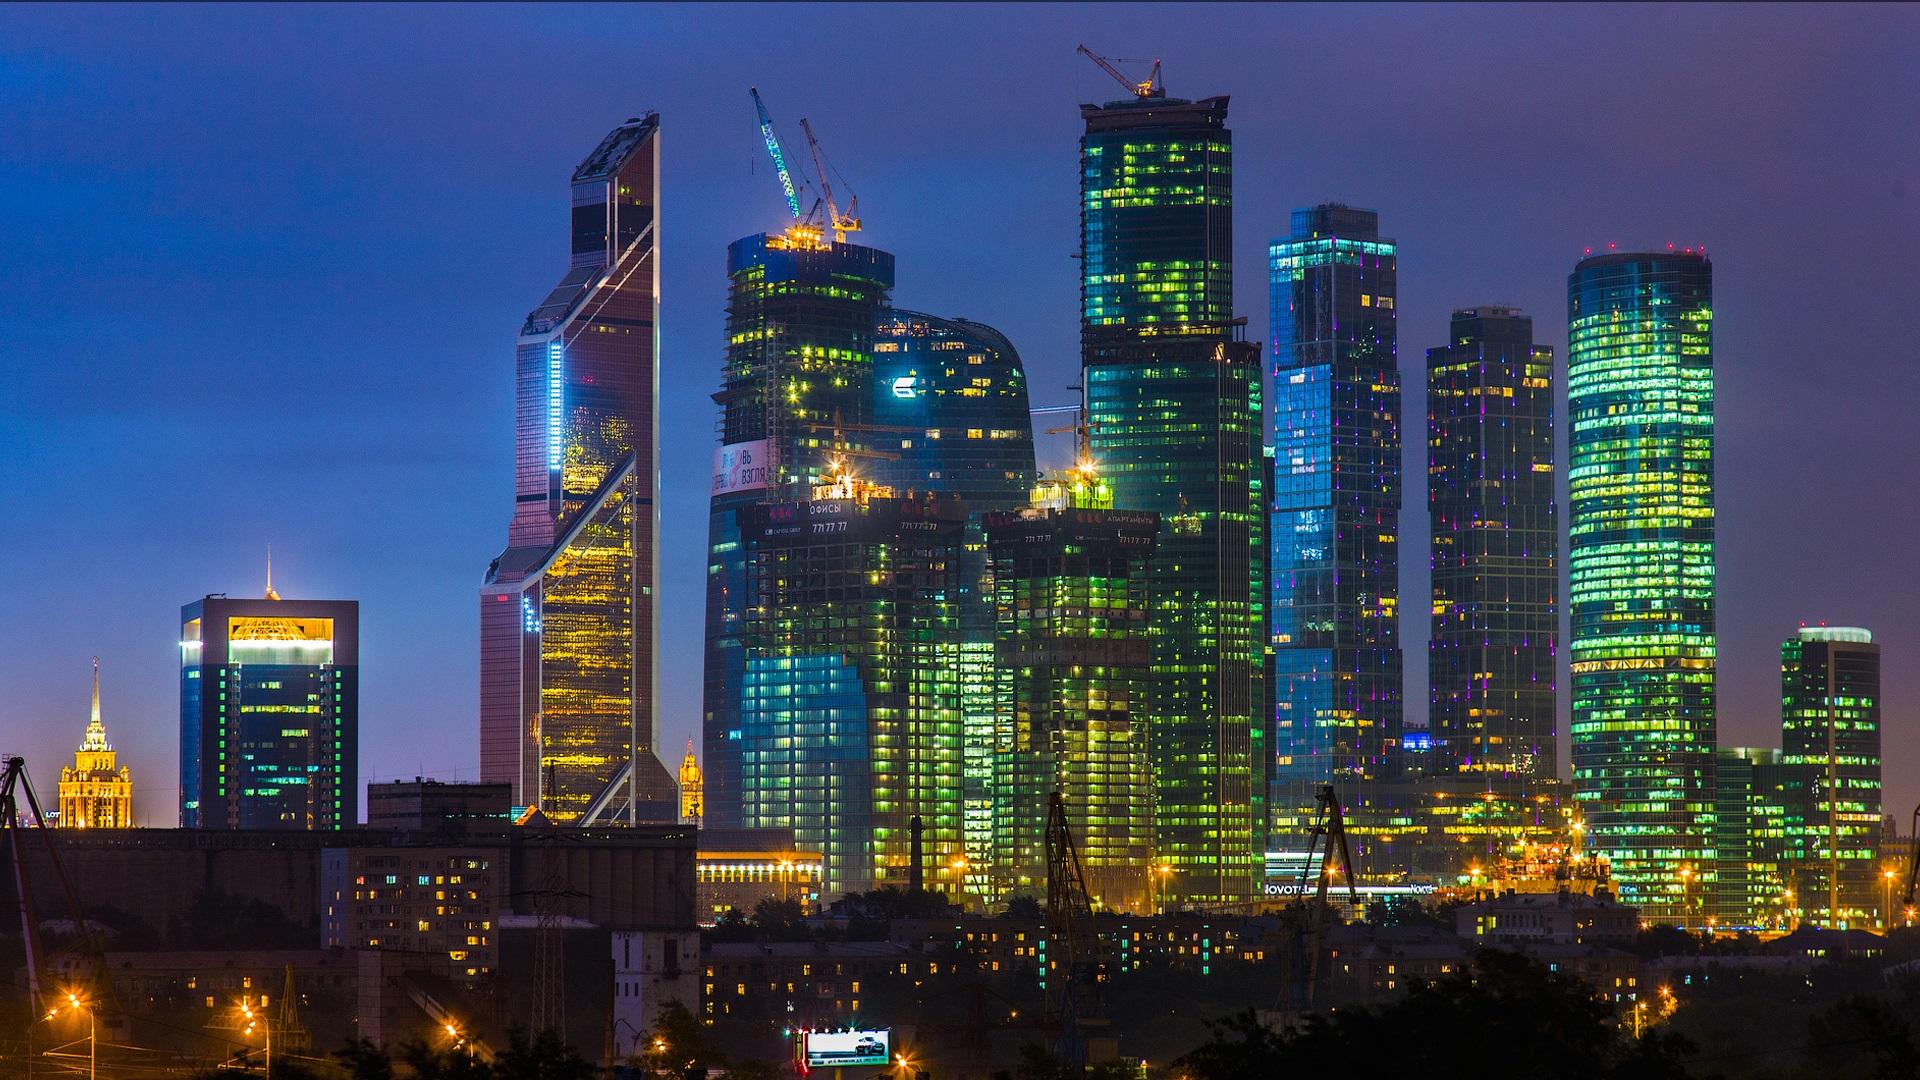 Wallpaper Beautiful City Night Moscow Skyscraper Lights